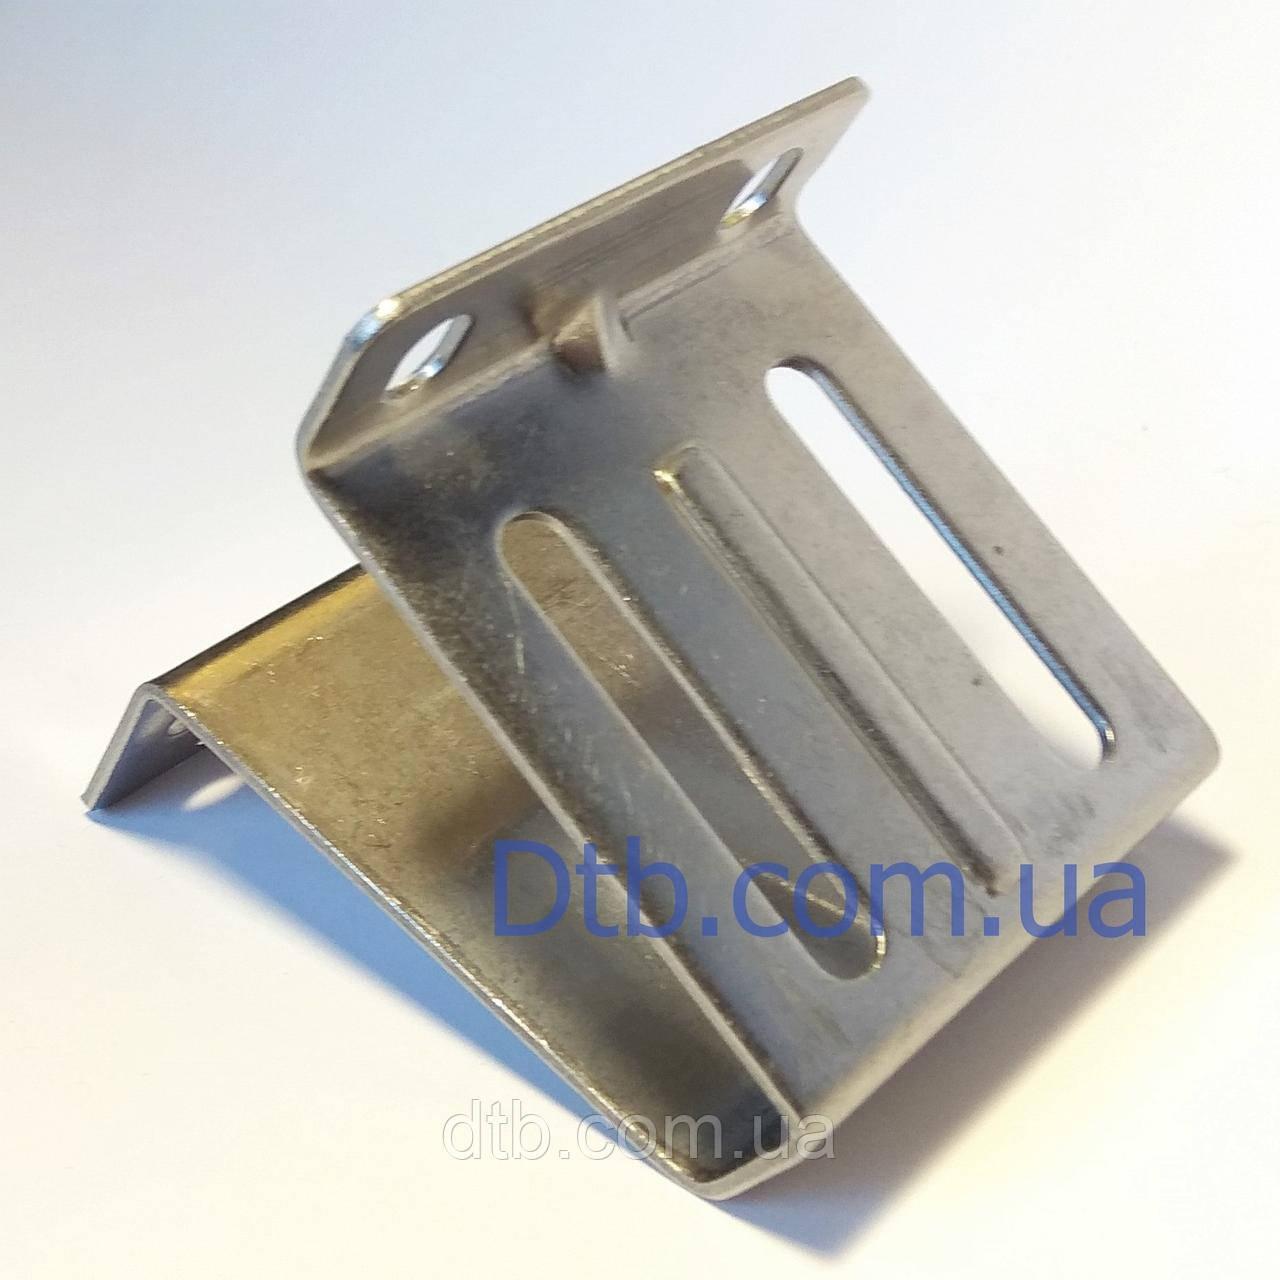 Кронштейн боковой для ролика ворот RBI123 Alutech нержавеющий